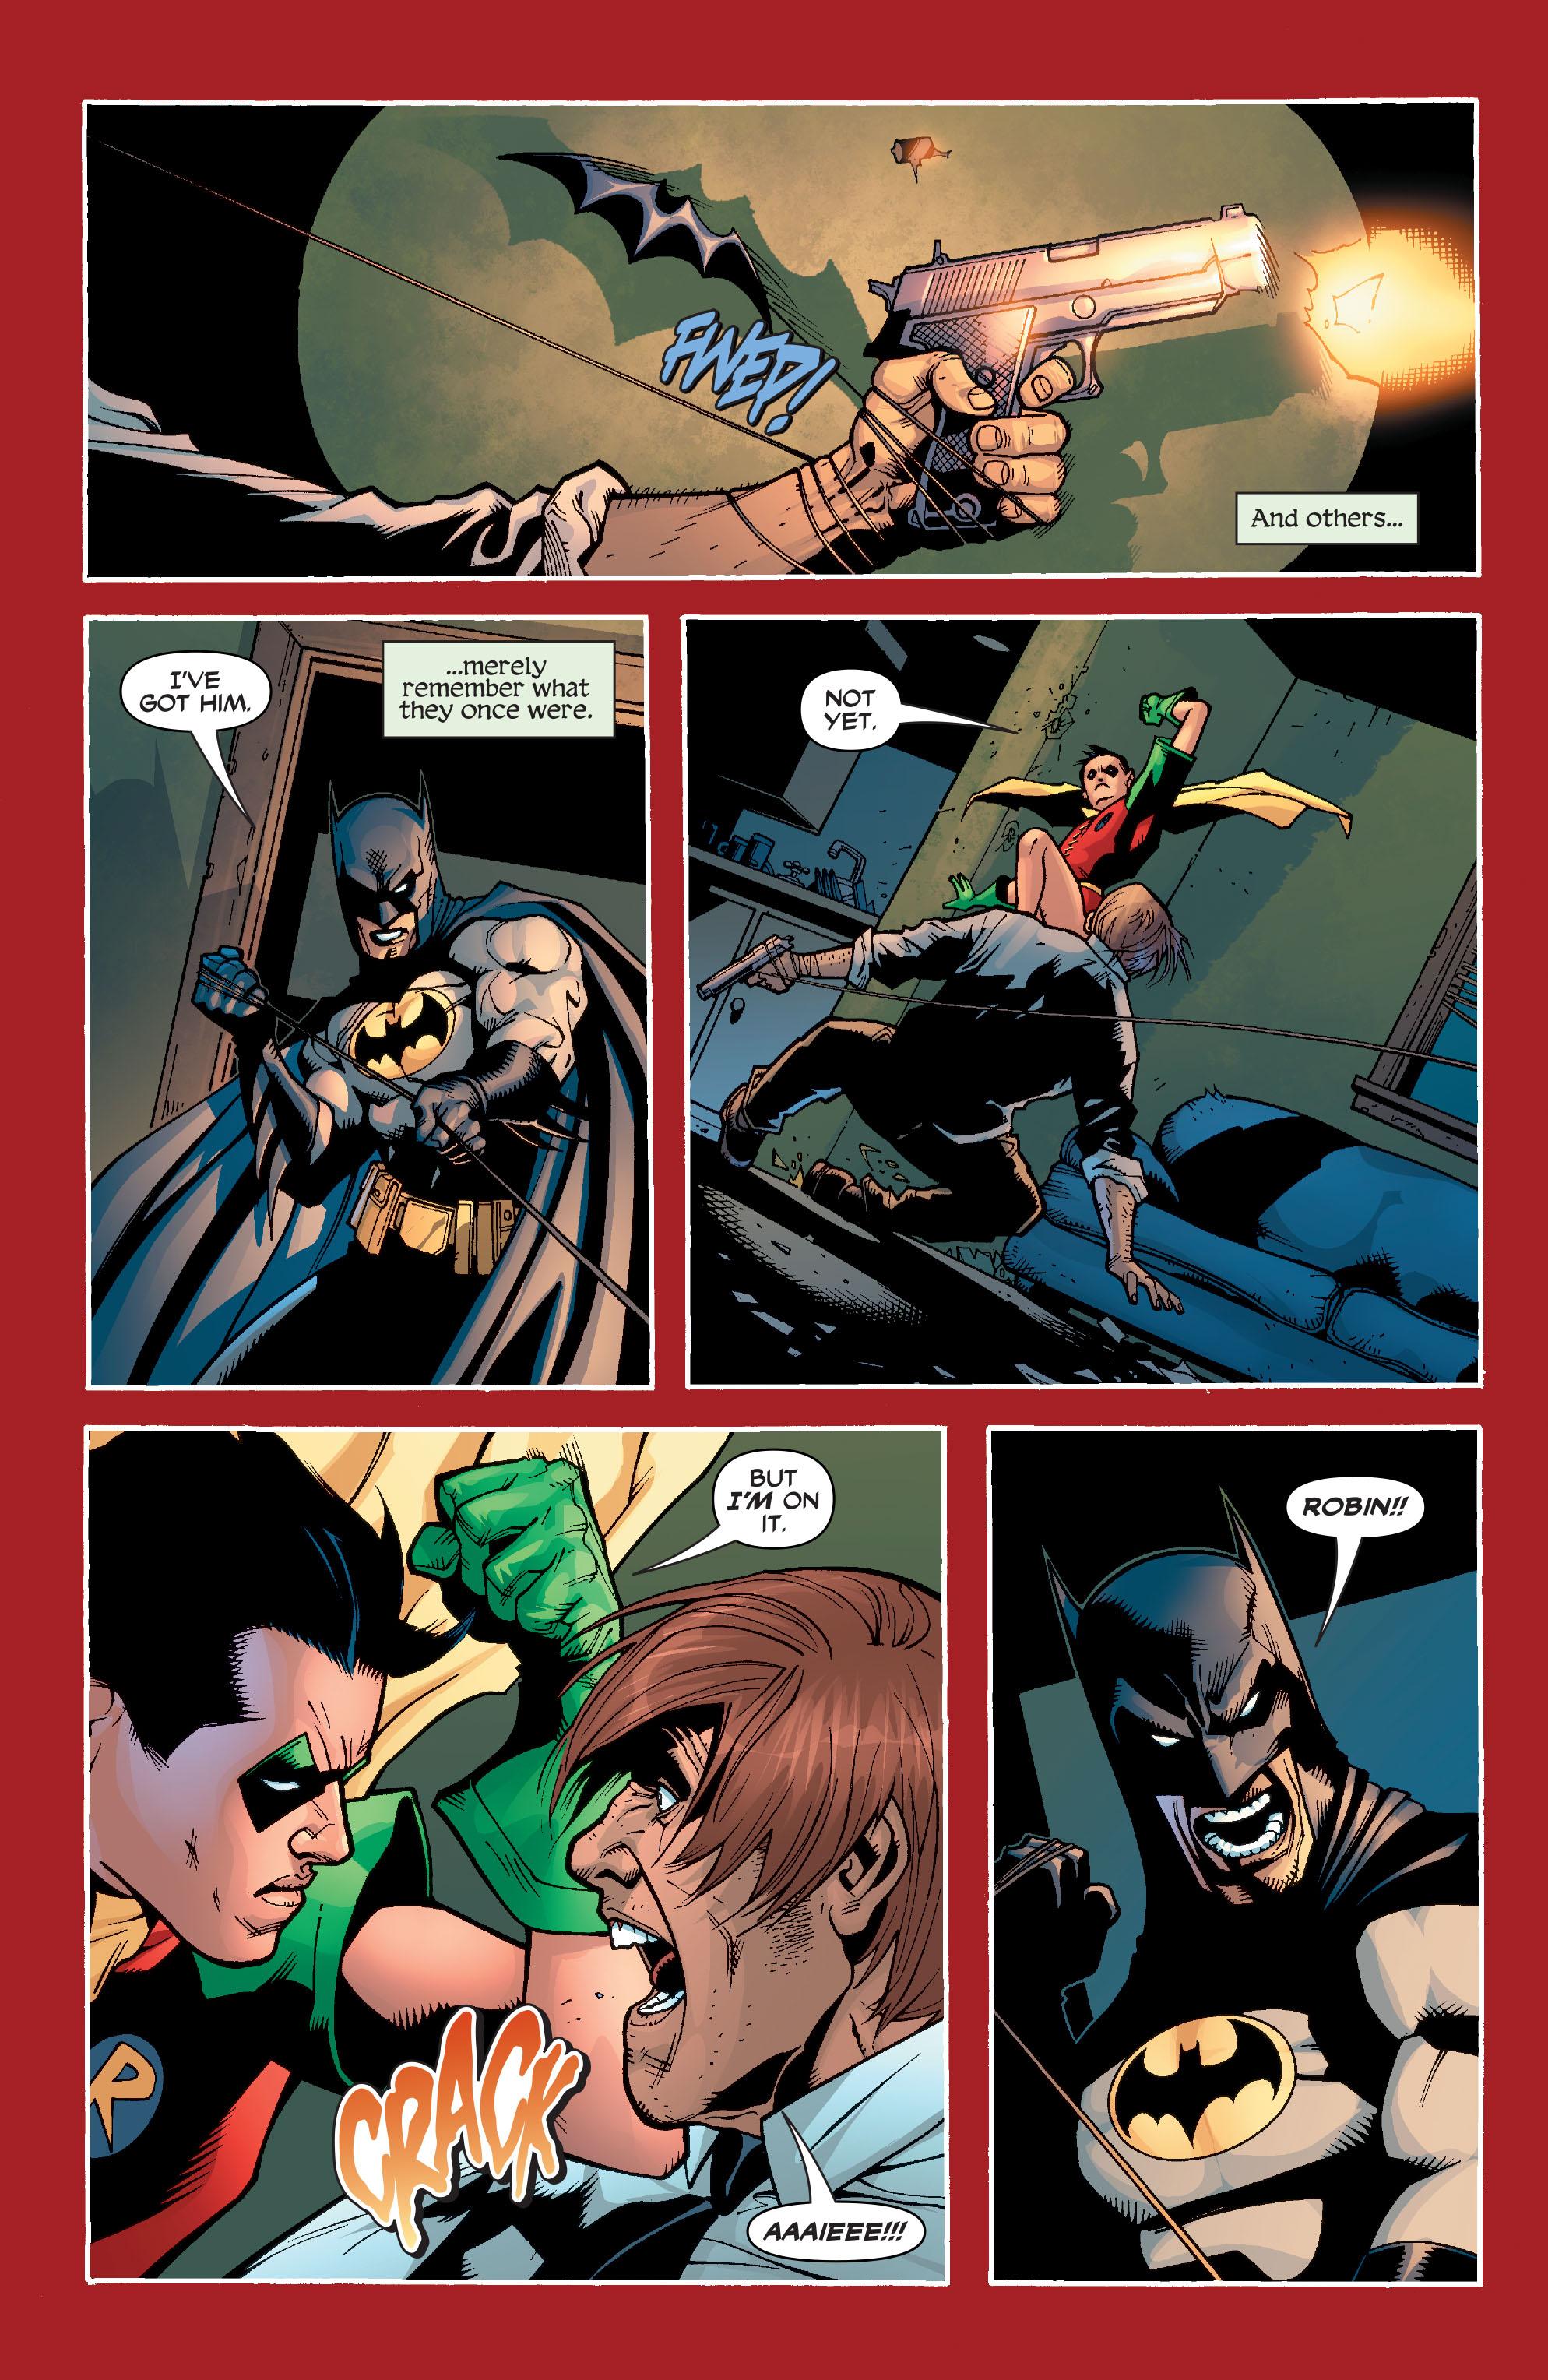 Psychology of Bruce Wayne XnIKFYolw78gviGS_R9hA4hUyZqBe2tOzU4riXtEmHtnxSfkAh4zXFtmun_e9Pa0gE3ITYsbZPE8=s0